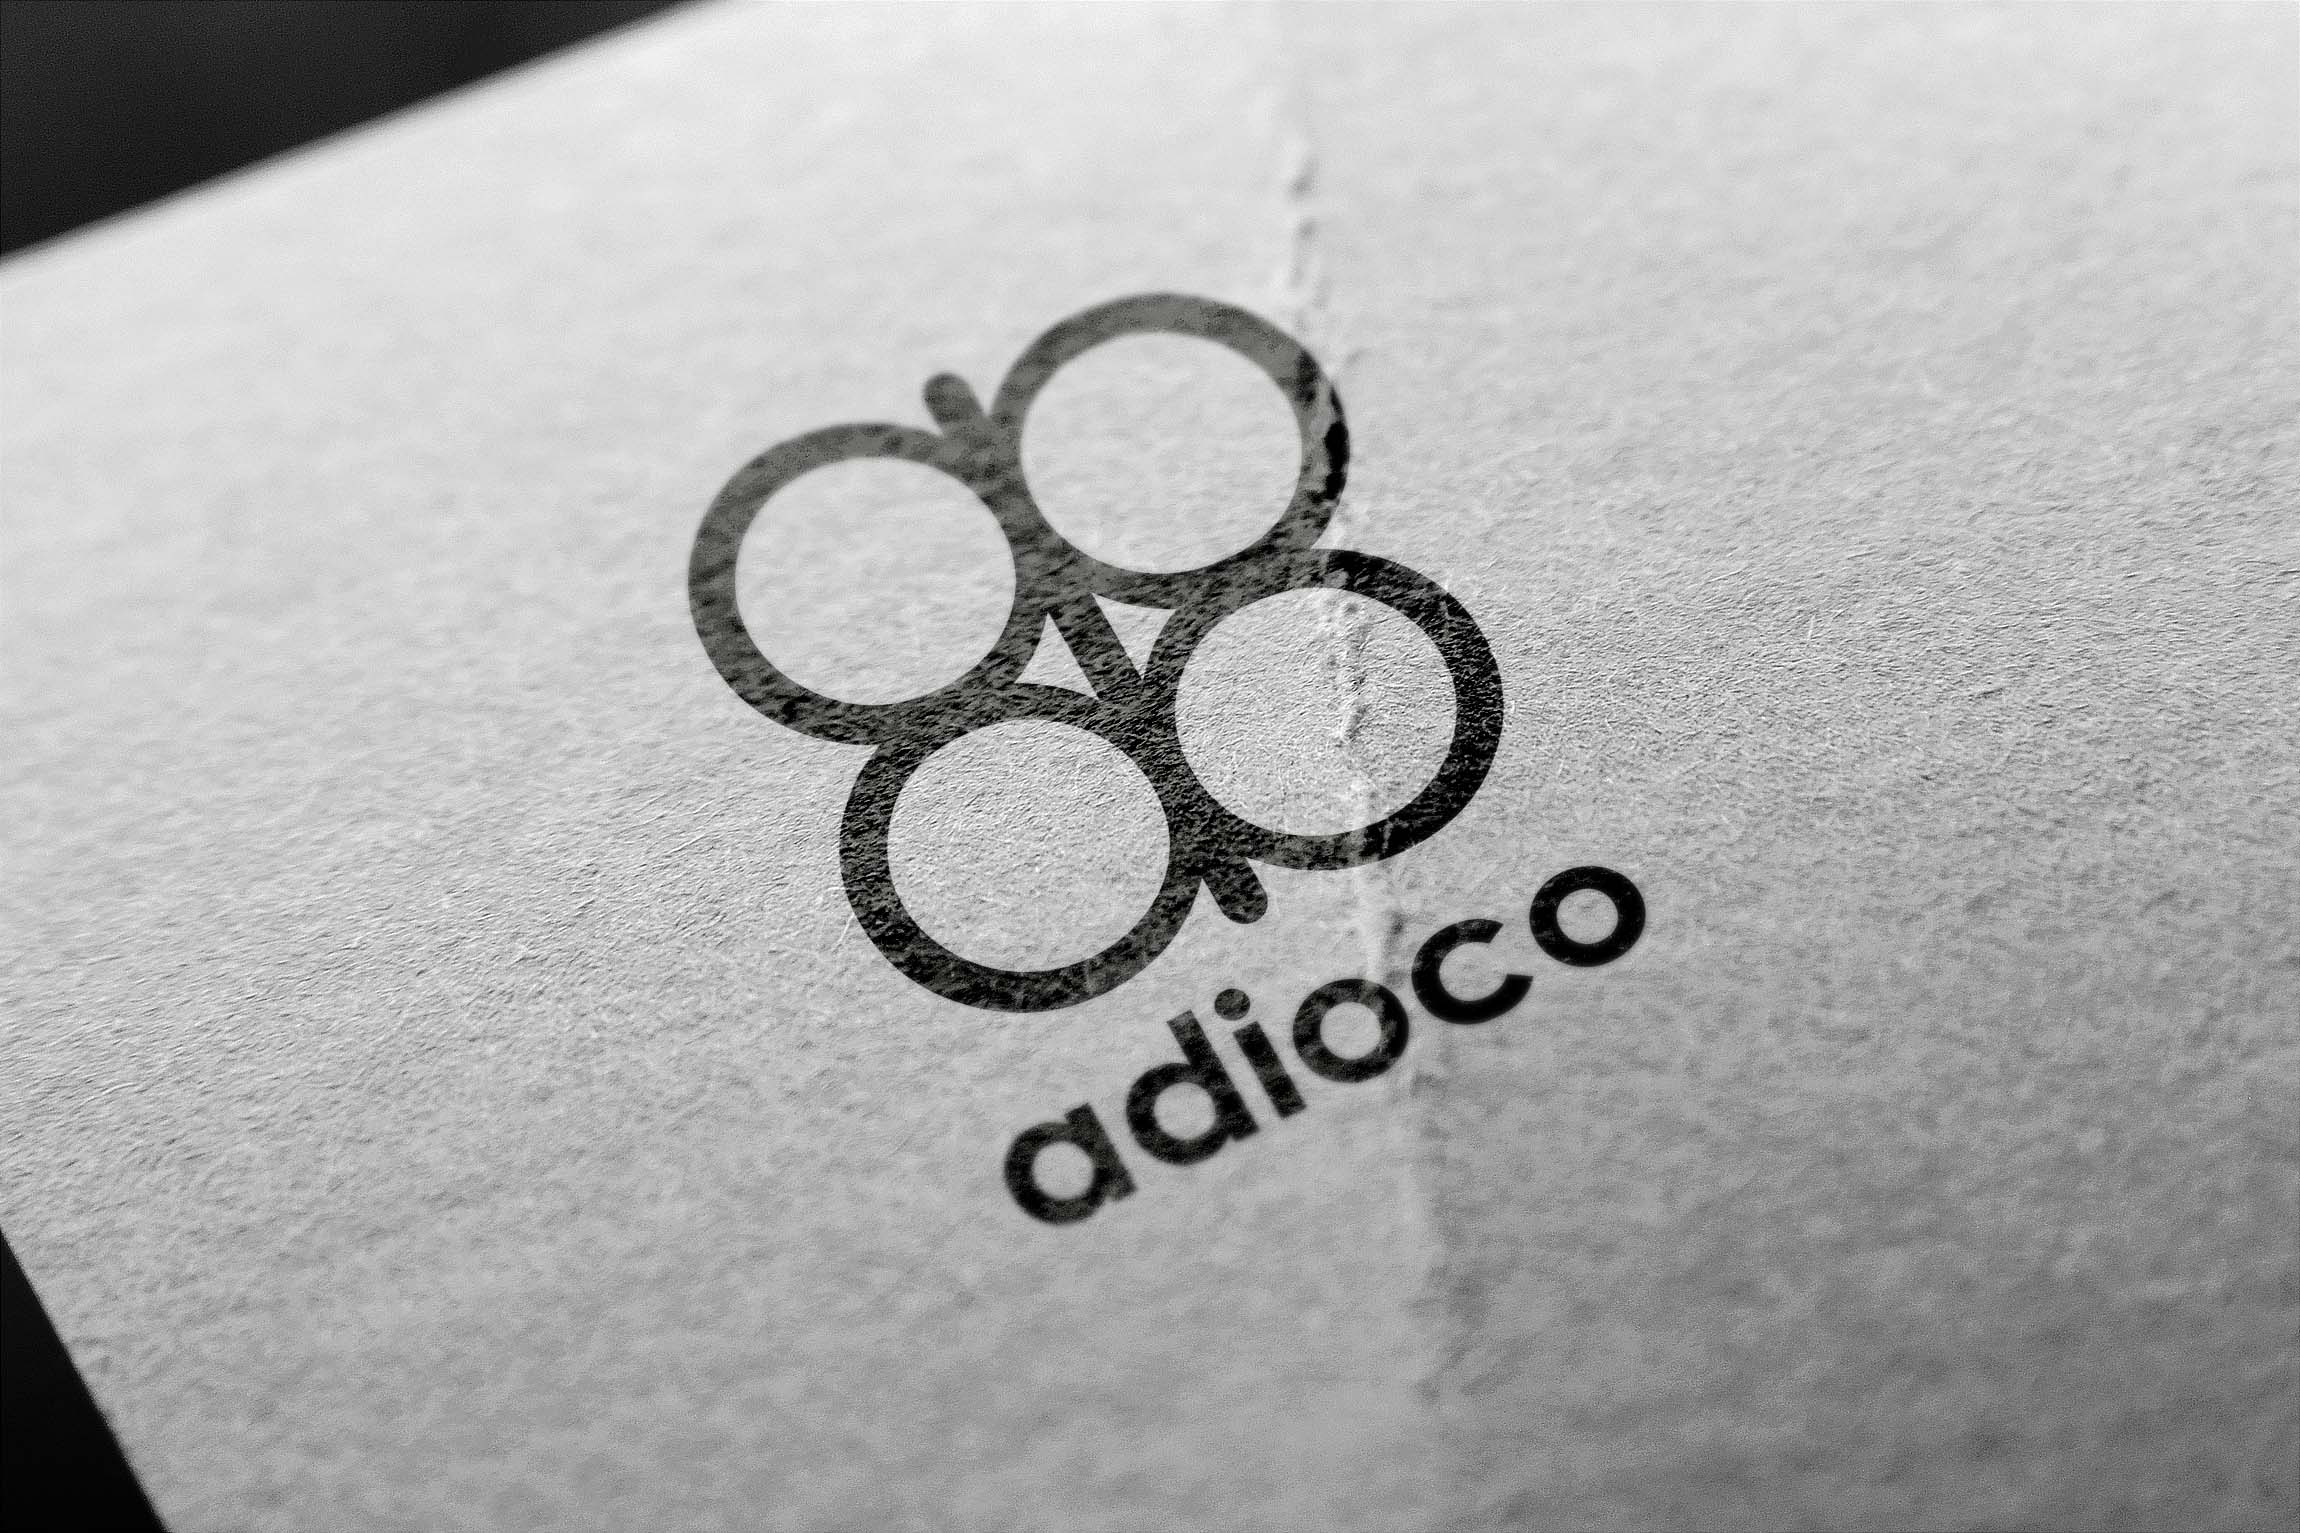 Adioco paper